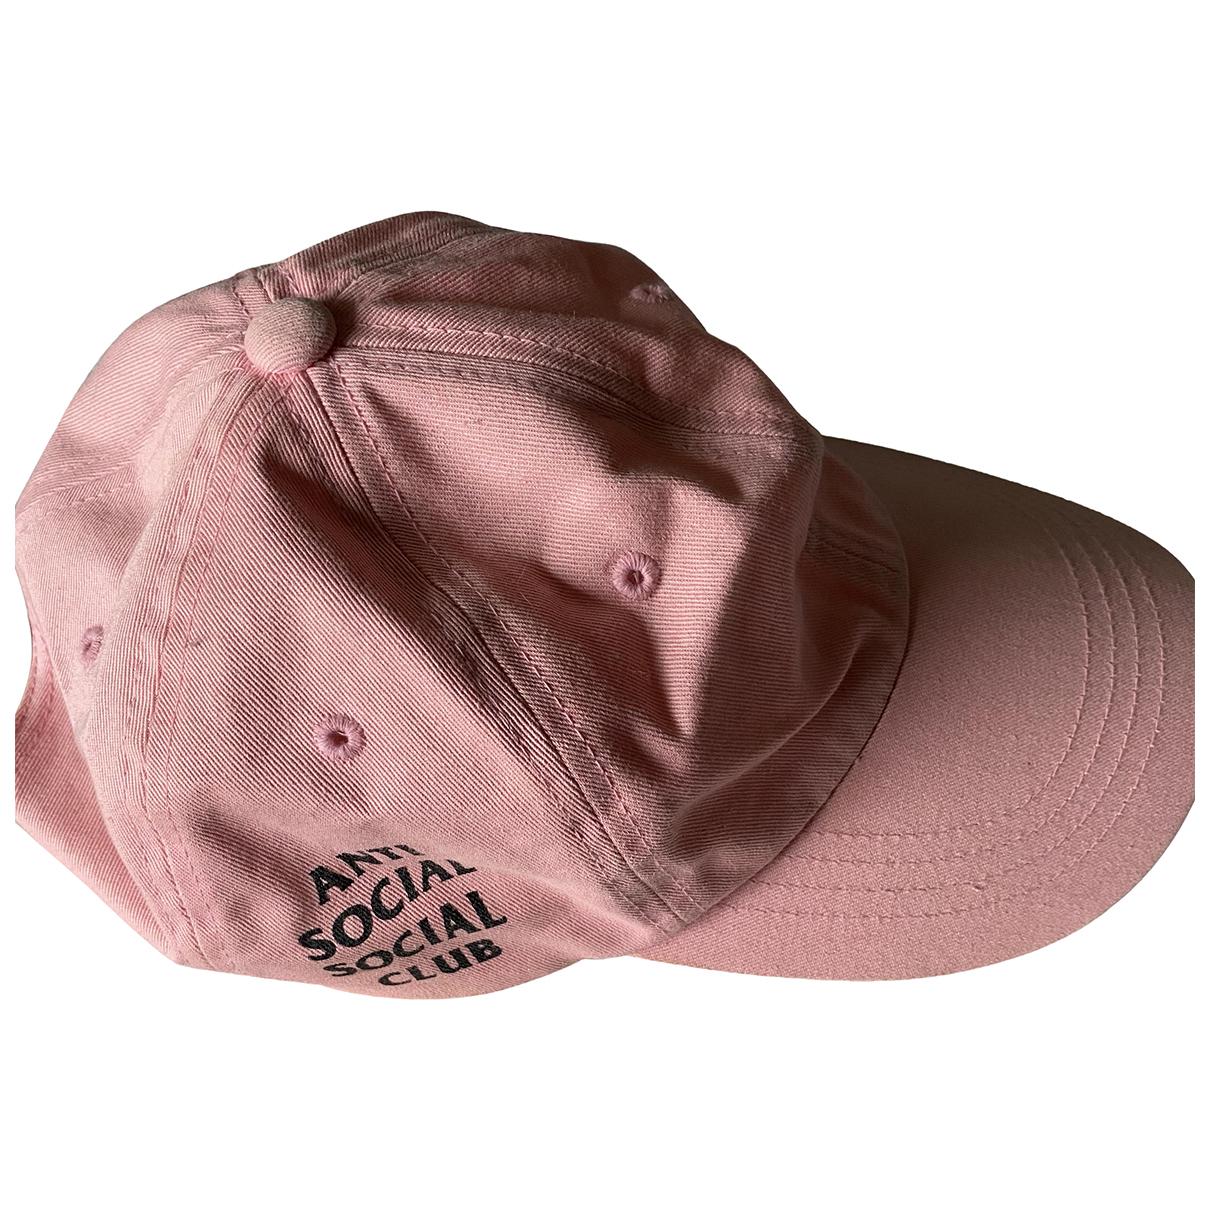 Anti Social Social Club \N Pink Cotton hat & pull on hat for Men S International